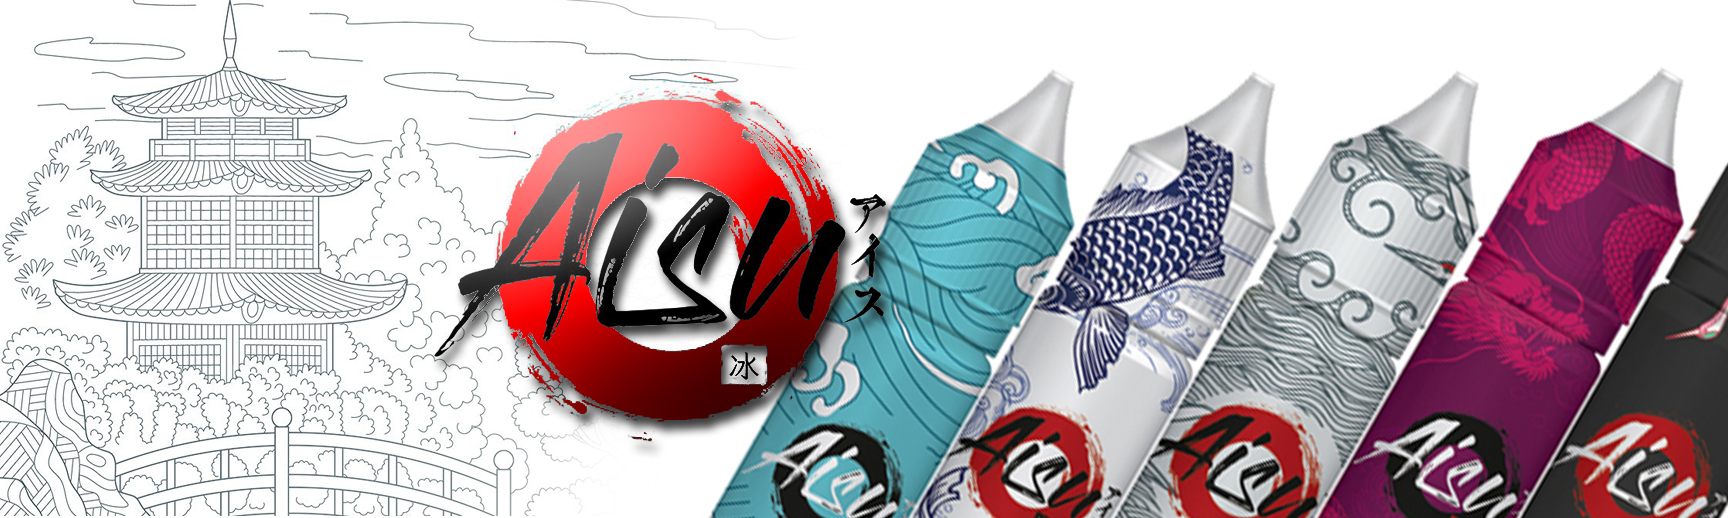 aisu-banner-1.jpg